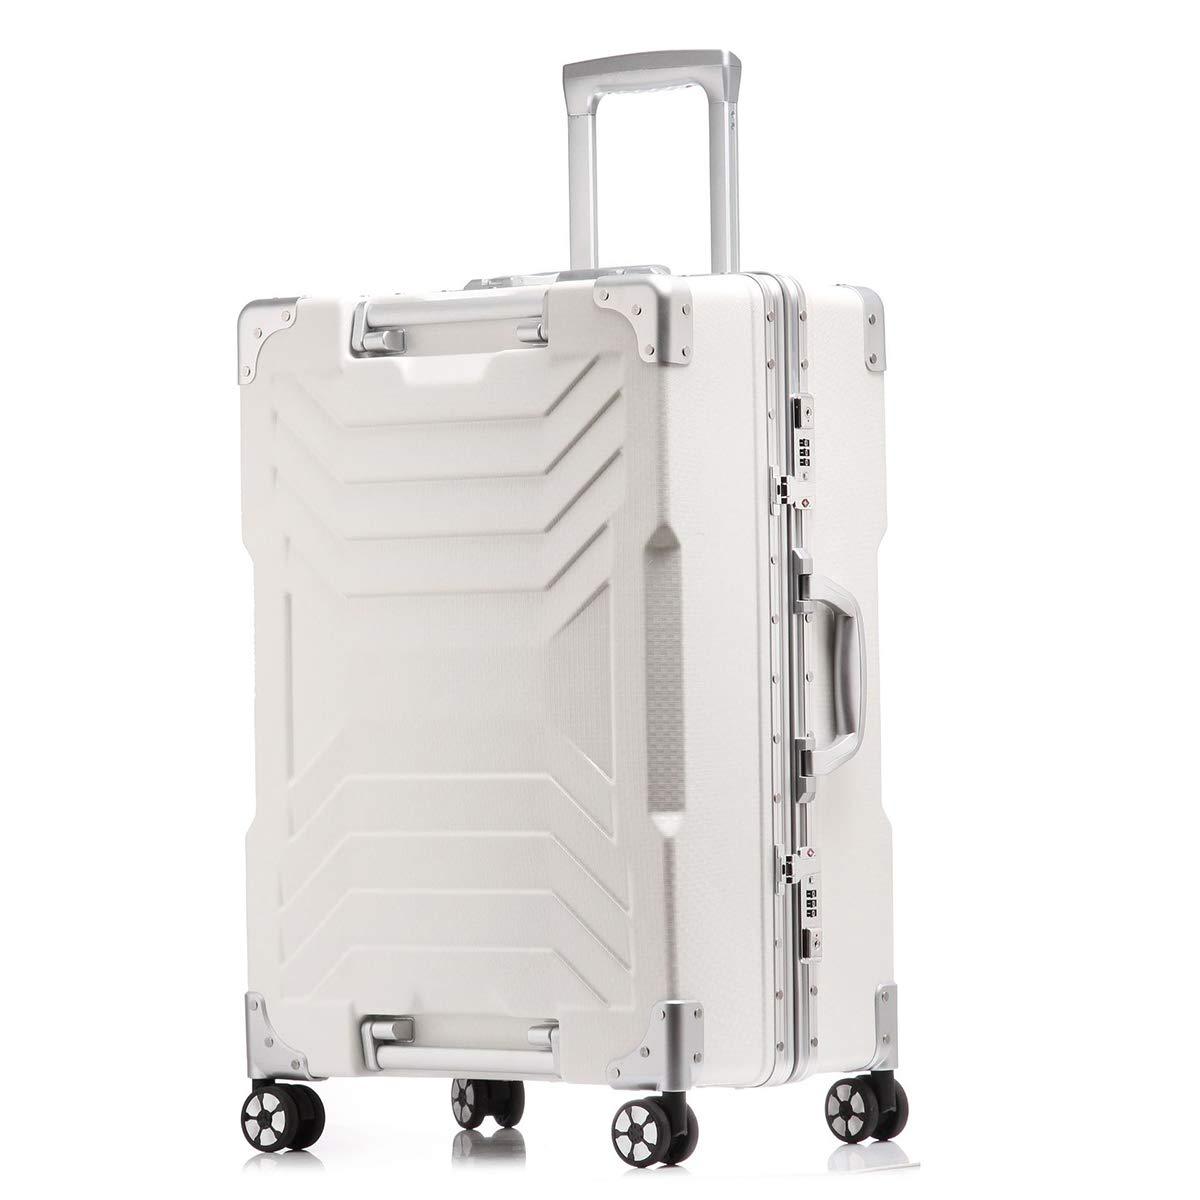 PCの旅行はトロリー小屋の軽量の堅い貝の耐久力のある車輪で運びます手の小屋の荷物のスーツケースで運びます,white,29inch B07QQR6PJP white 29inch